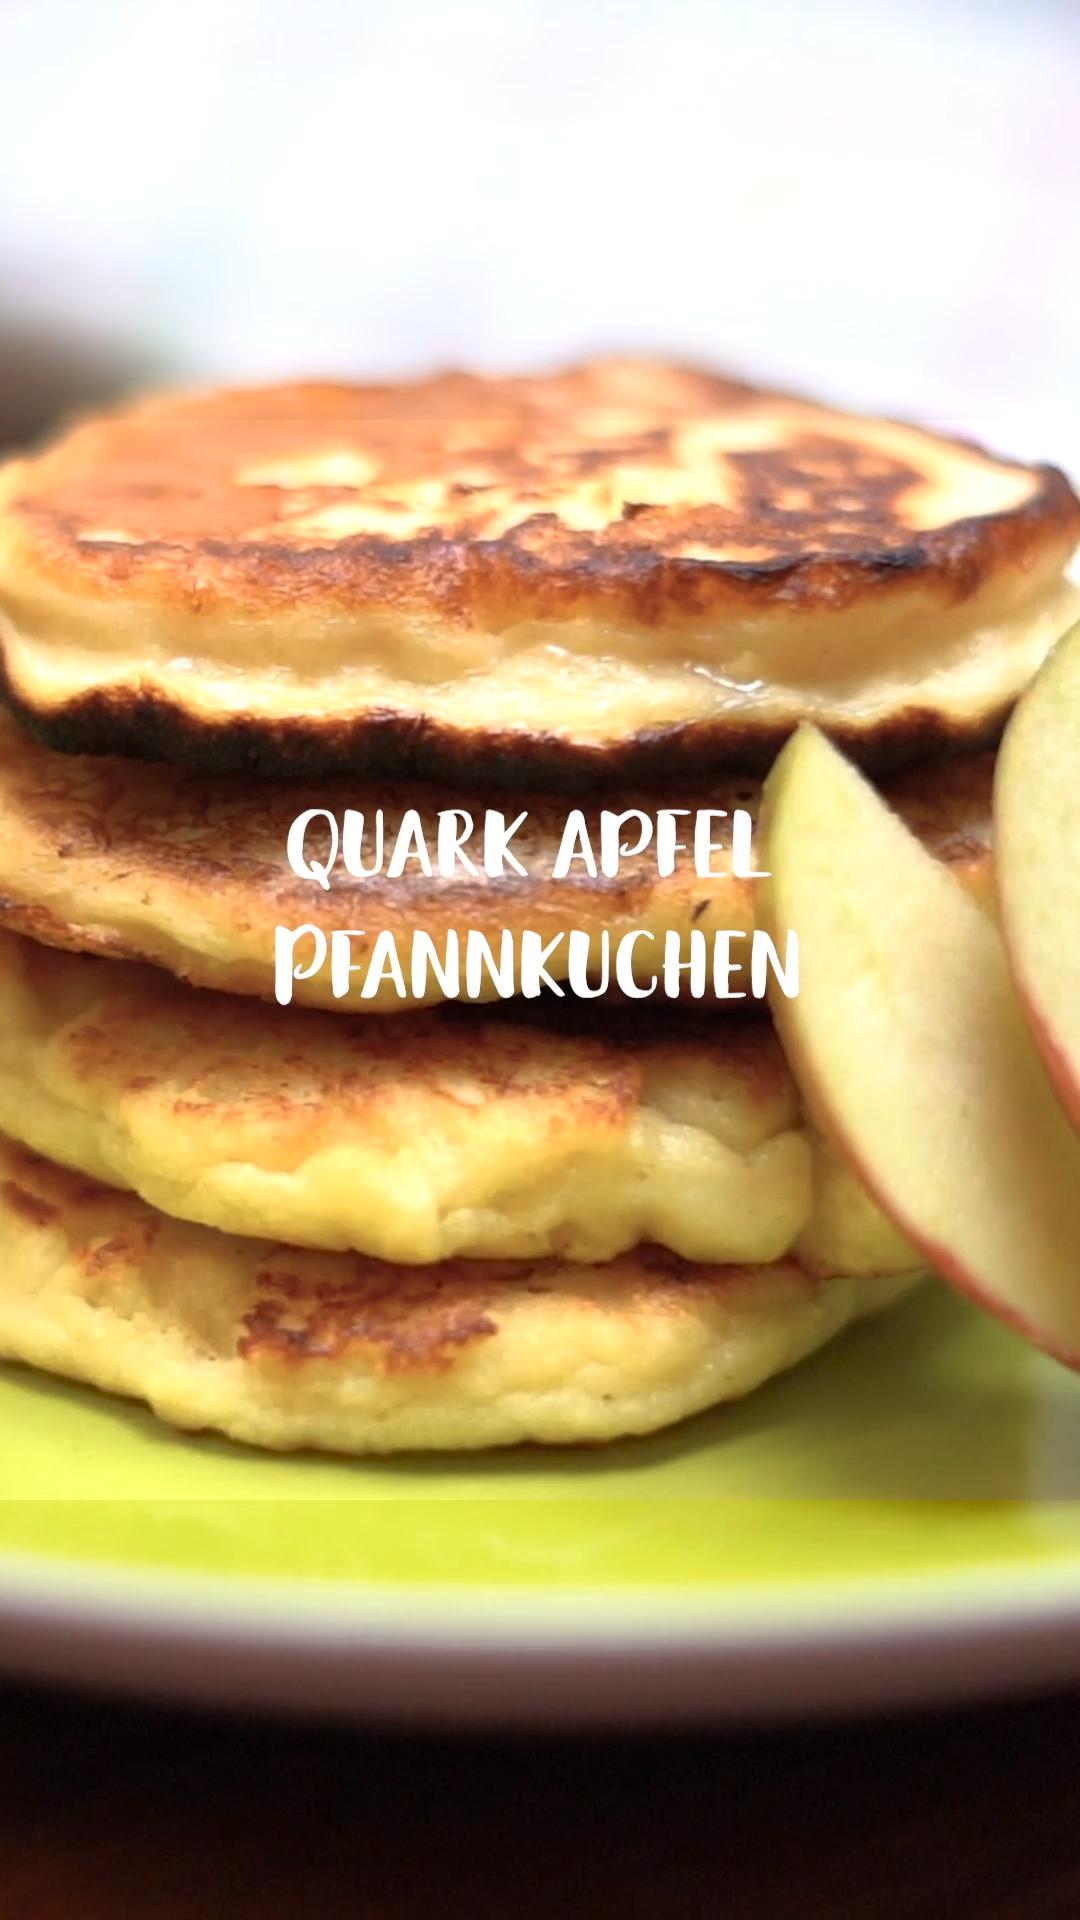 Quark-Apfel-Pfannkuchen